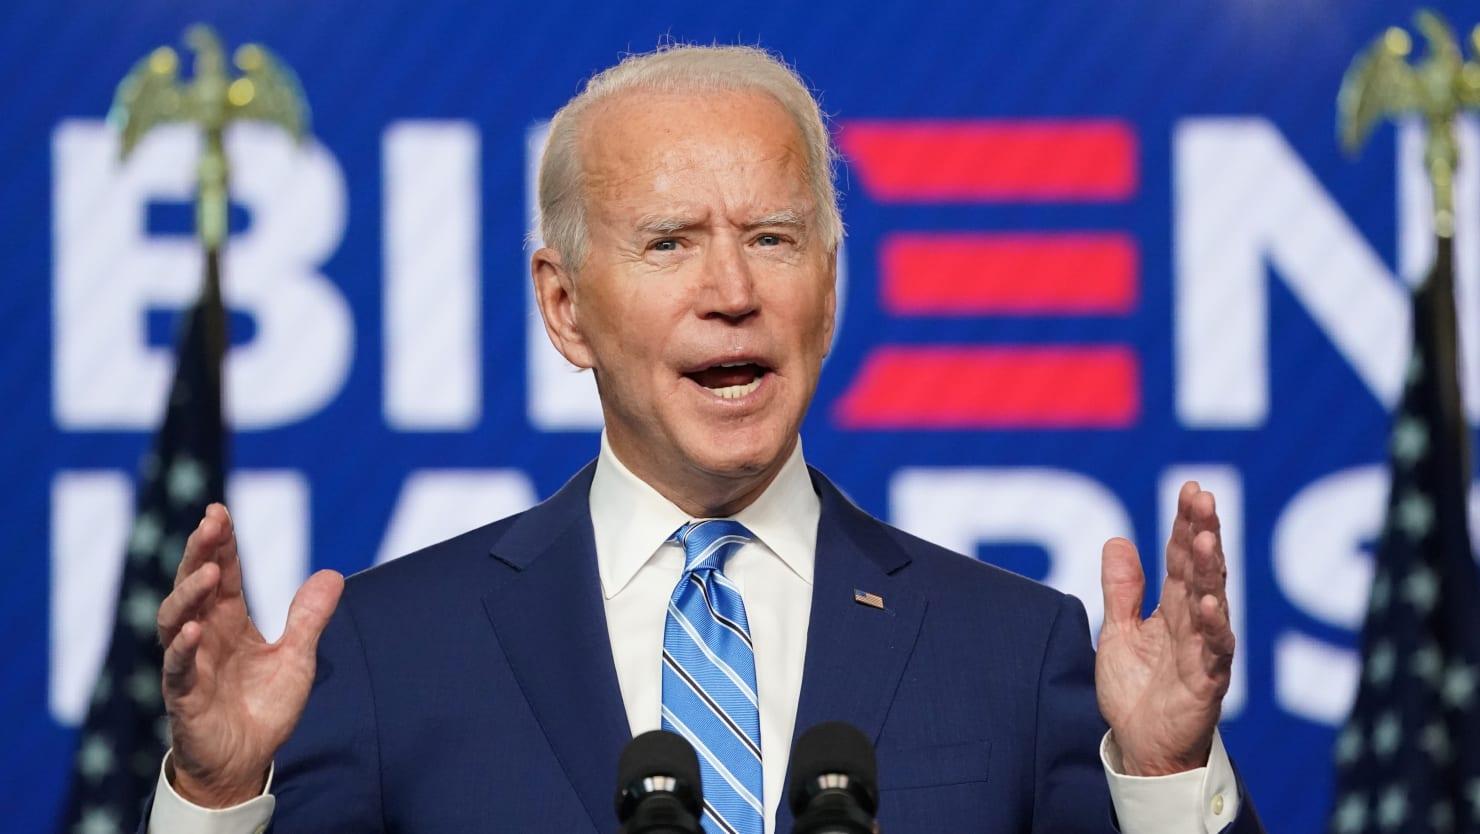 Joe Biden to Americans: Keep Calm, Count the Votes